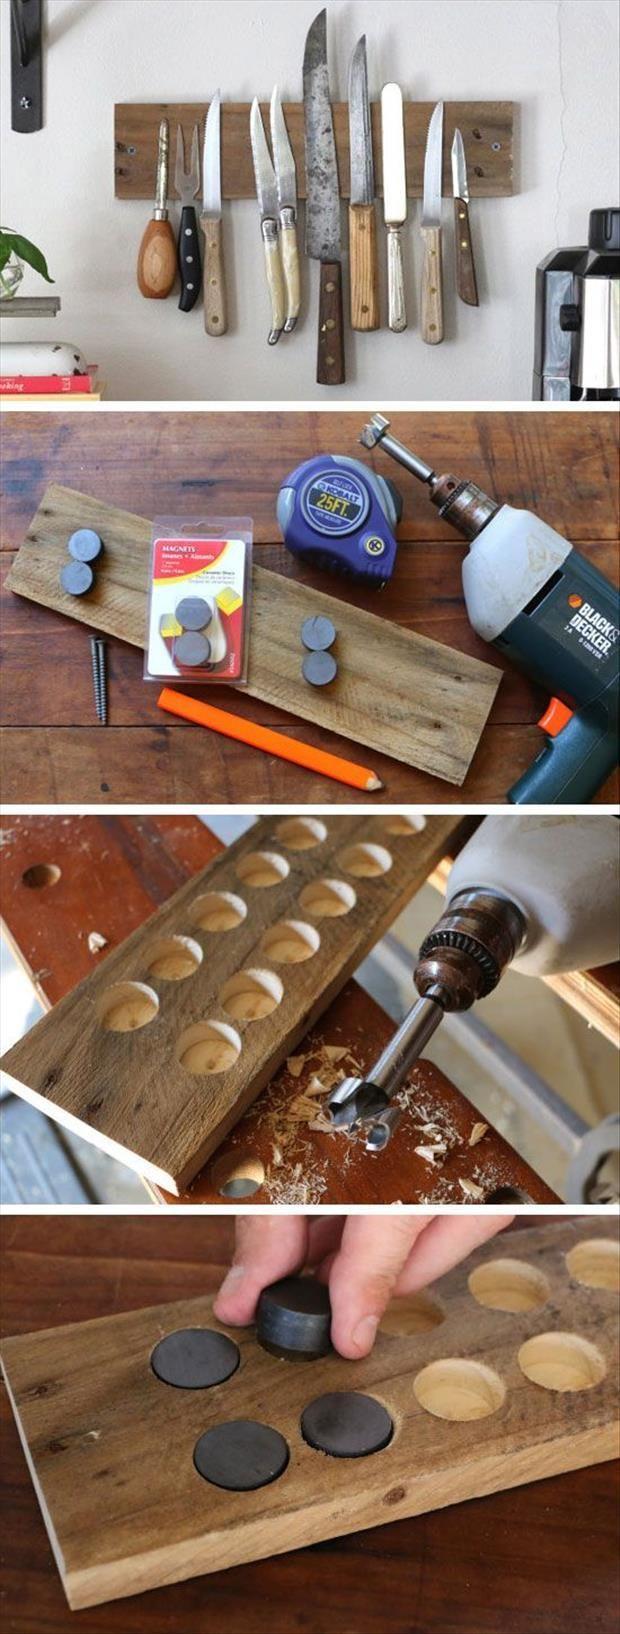 Pin by ida nyrum on kreativitet pinterest fun diy crafts wooden